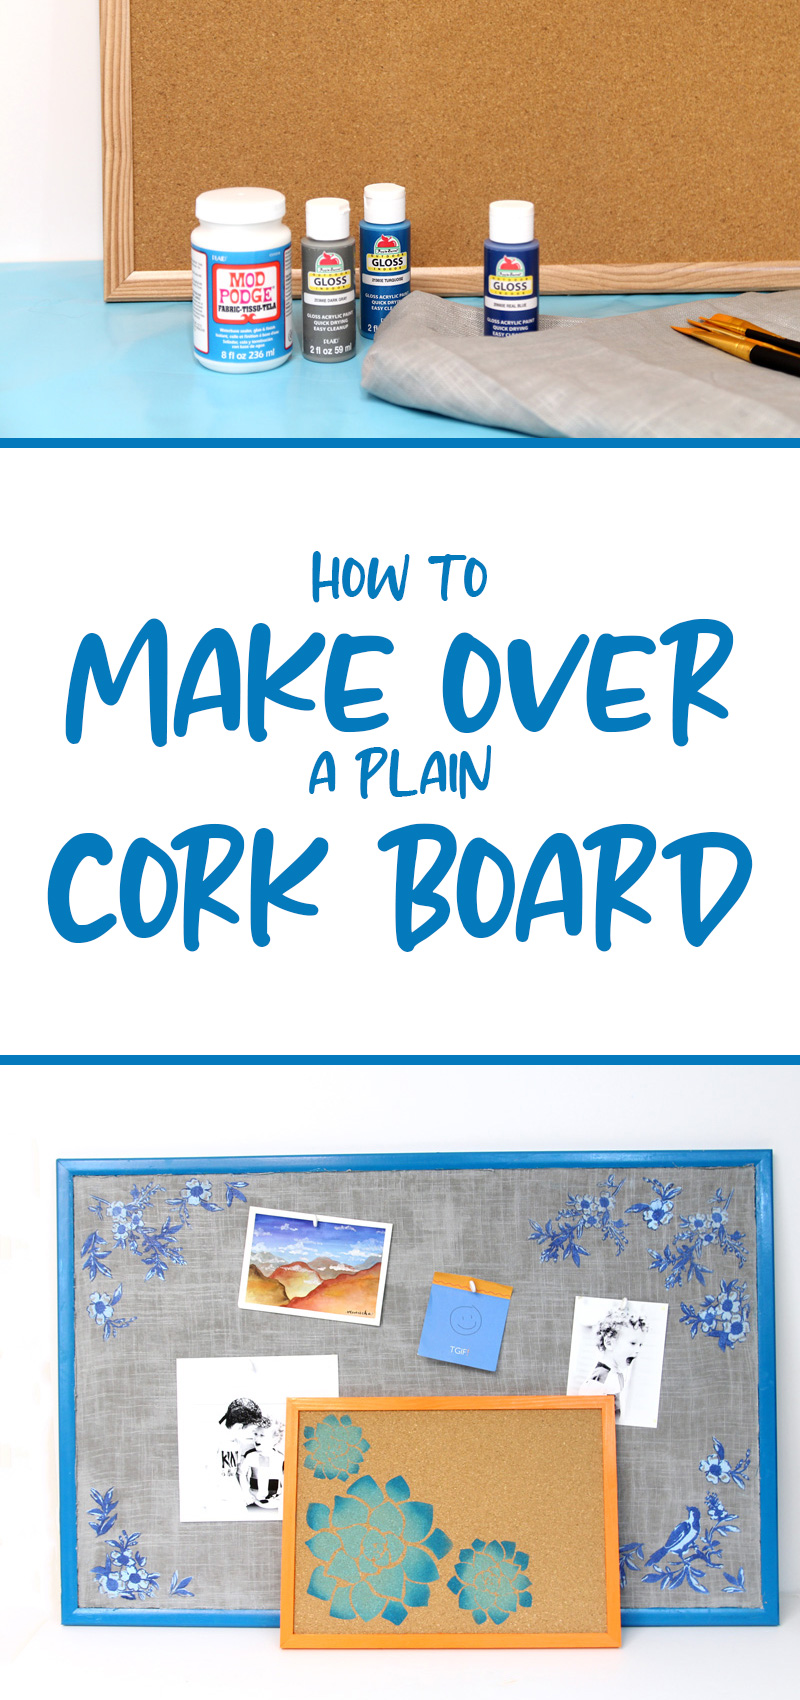 DIY cork board makeover ideas collage image